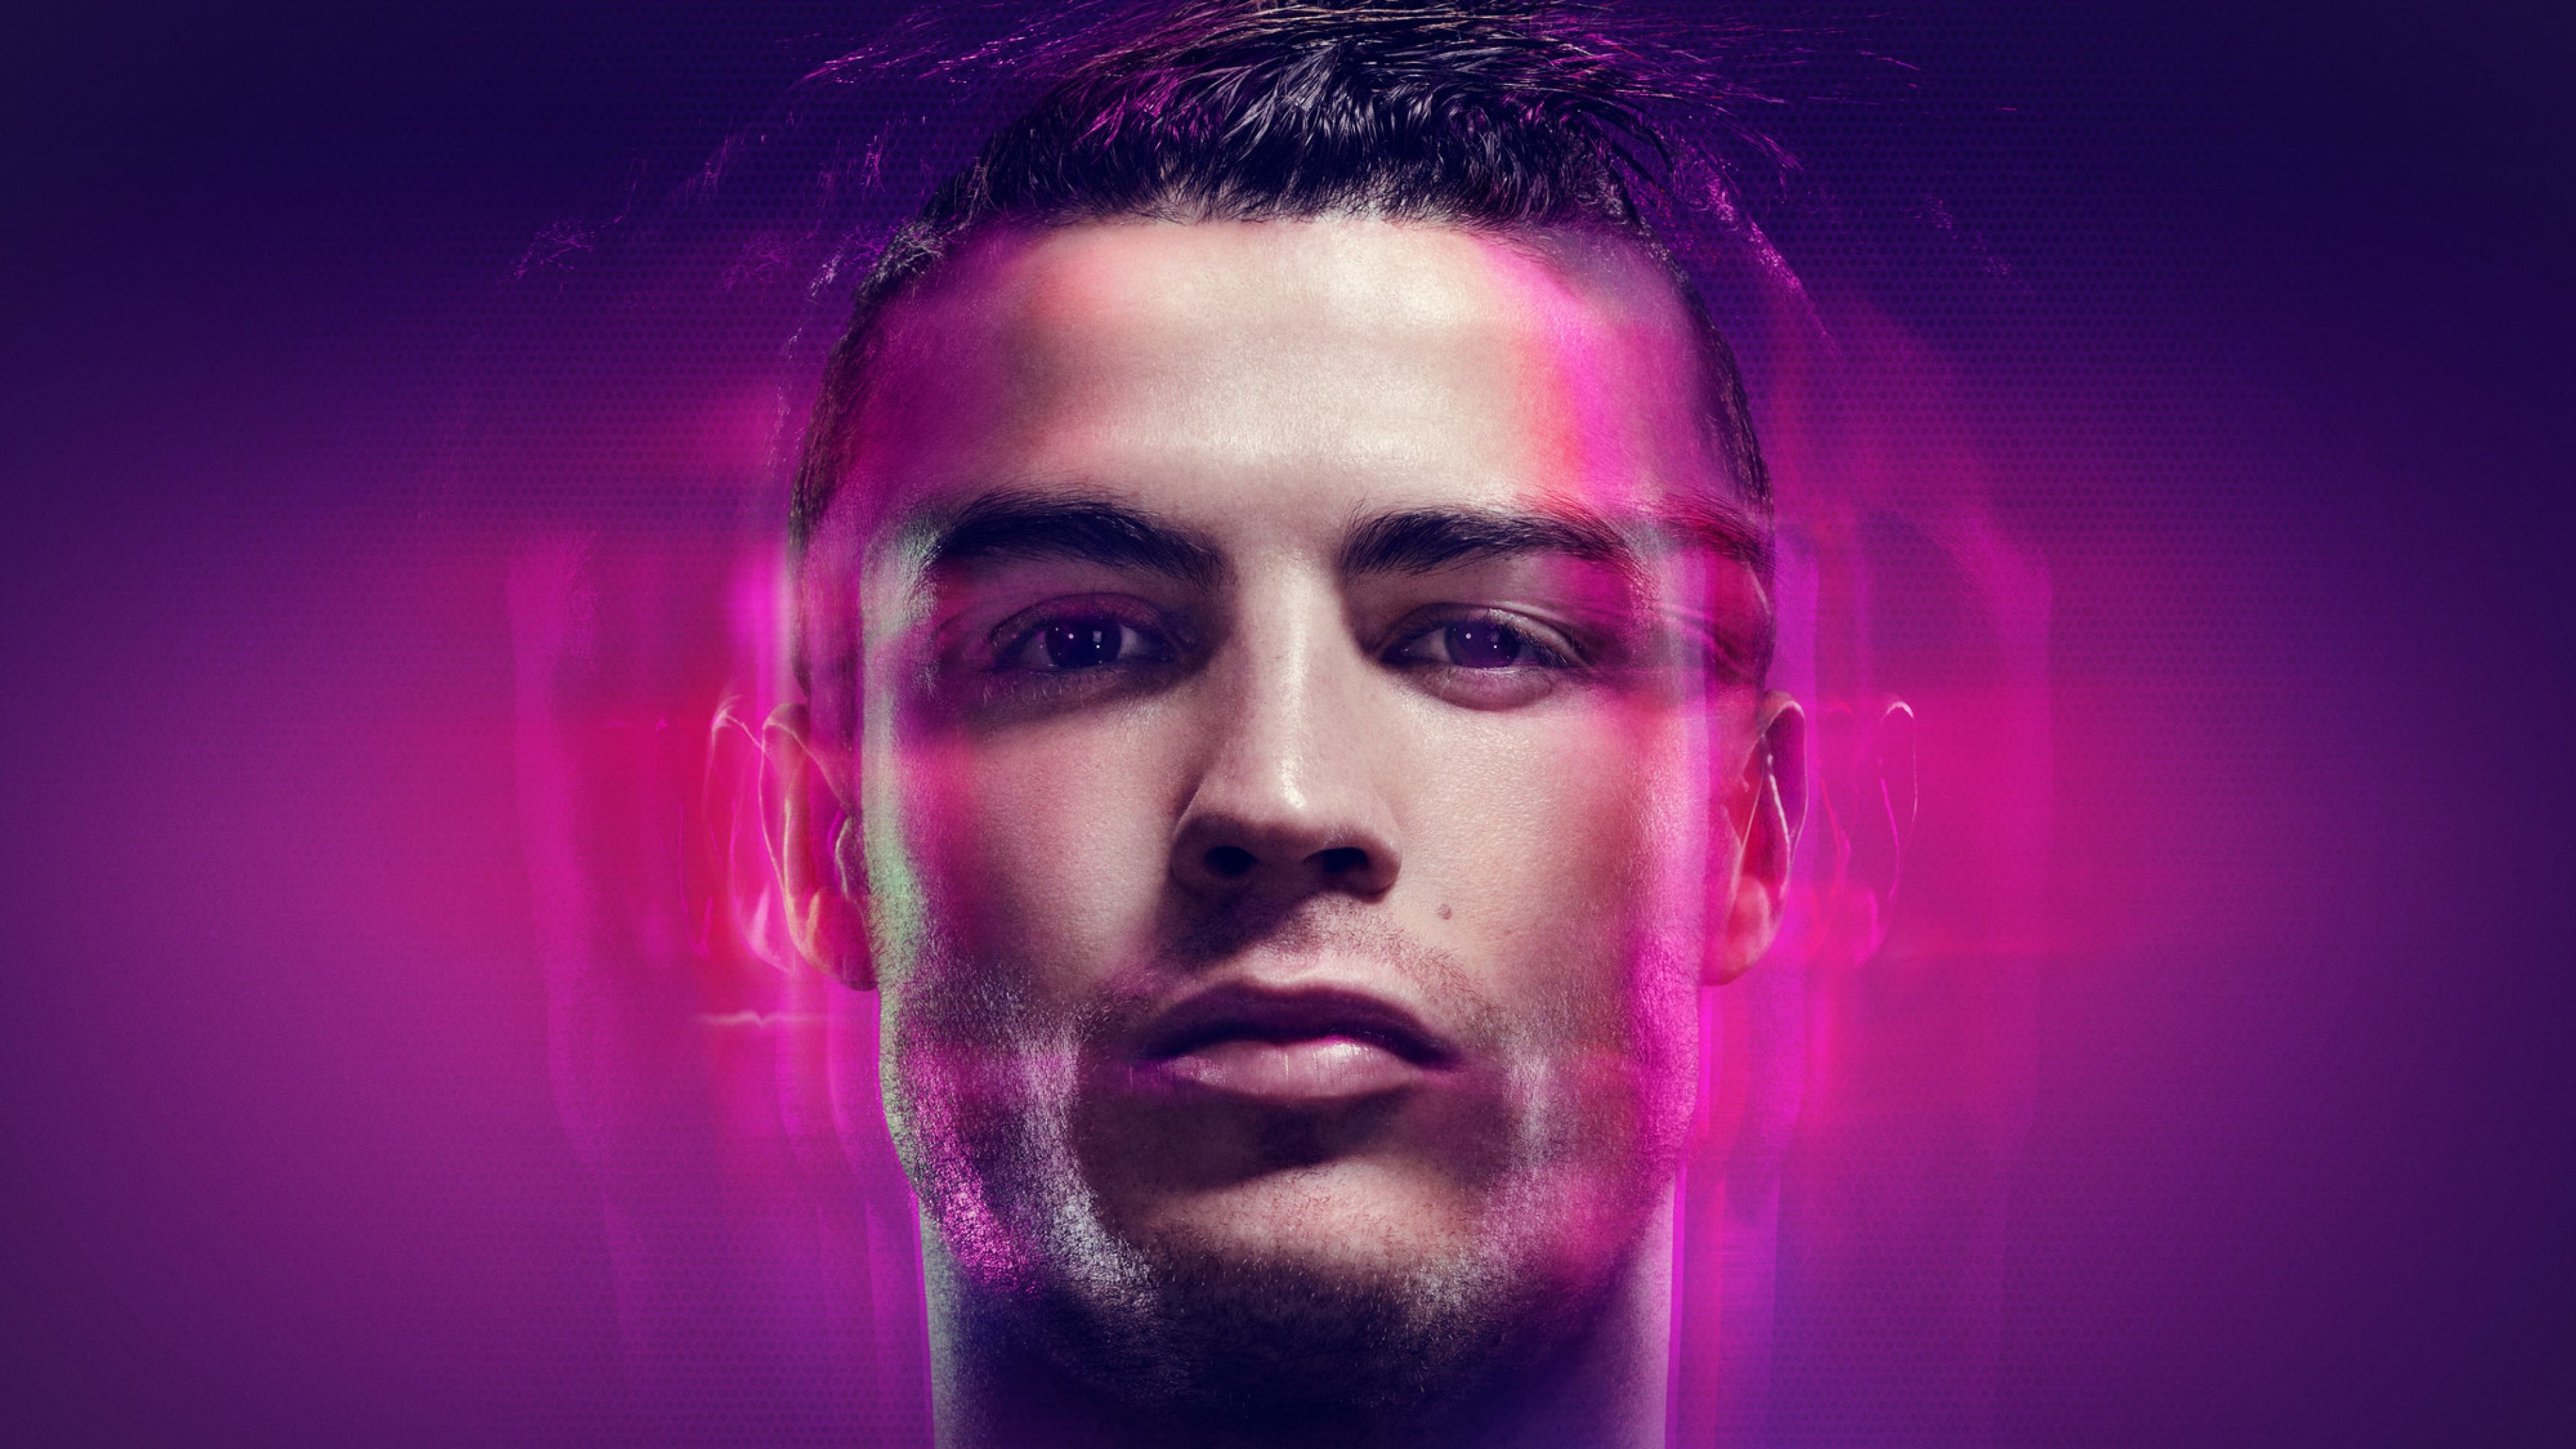 Cristiano Ronaldo 4k Ronaldo Cristiano Ronaldo Wallpapers